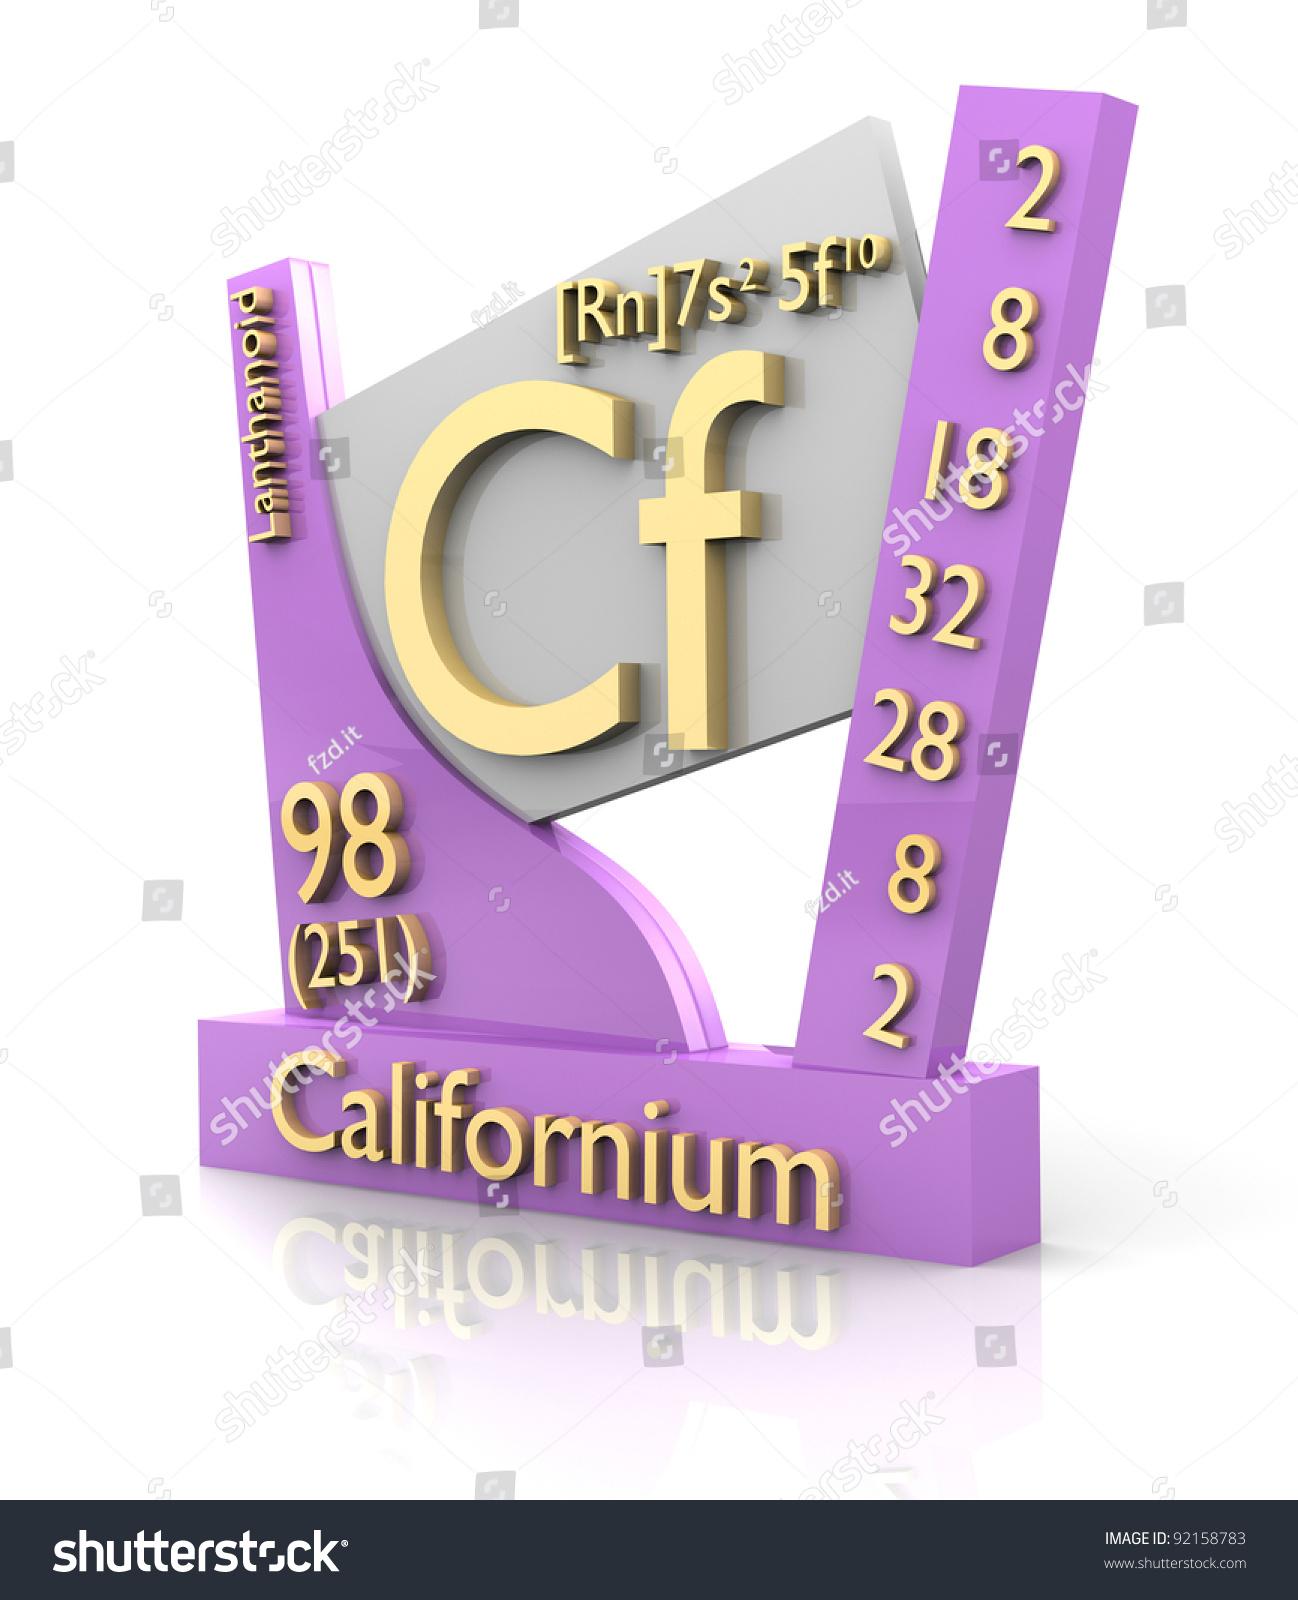 Californium form periodic table elements 3d stock illustration californium form periodic table of elements 3d made gamestrikefo Images